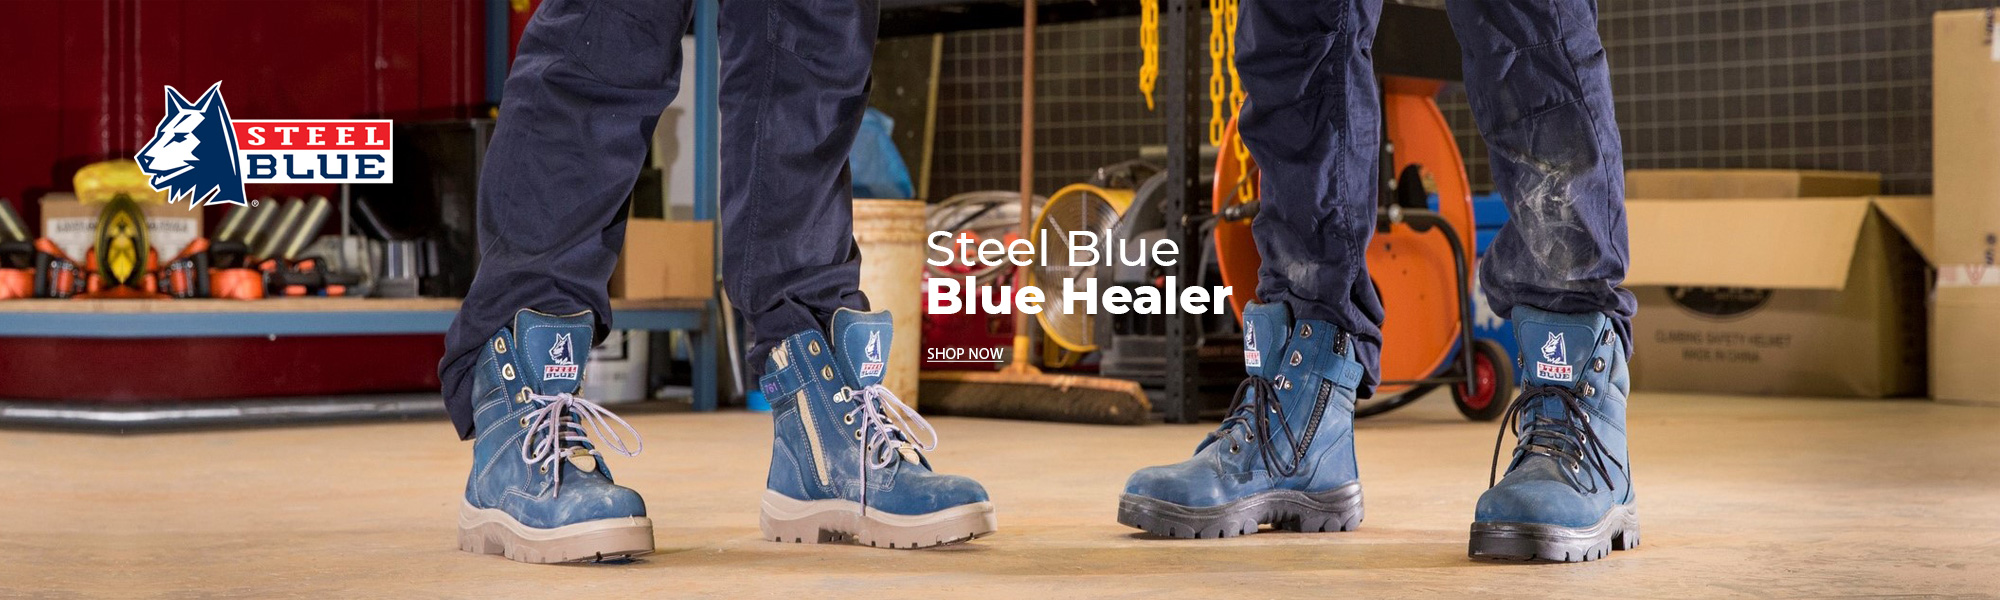 steelblue blue healer